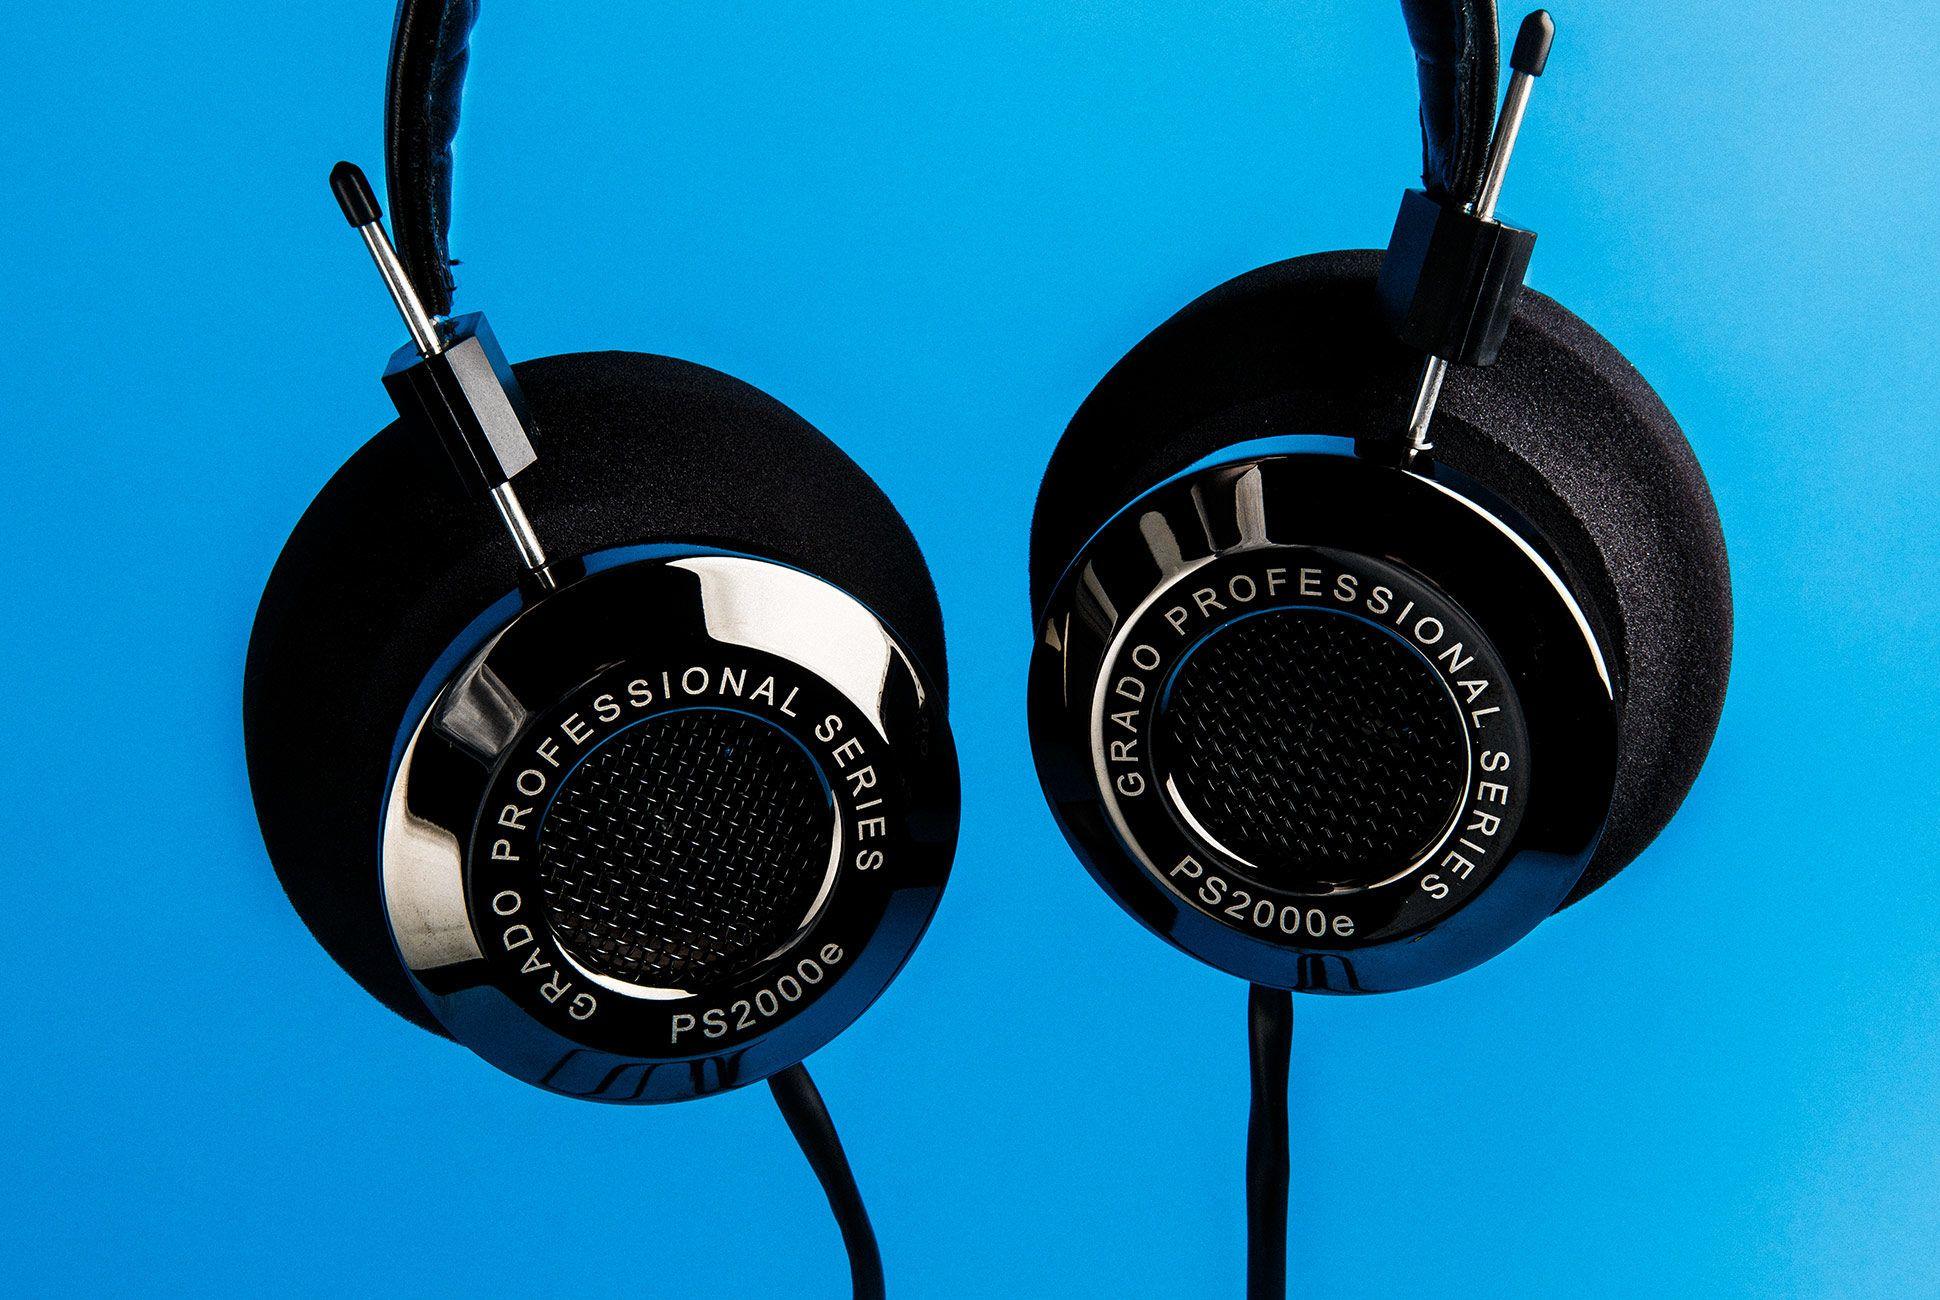 55737498564 Grado PS2000e Review: The Best Hi-Fi Headphones Money Can Buy | Tech ...